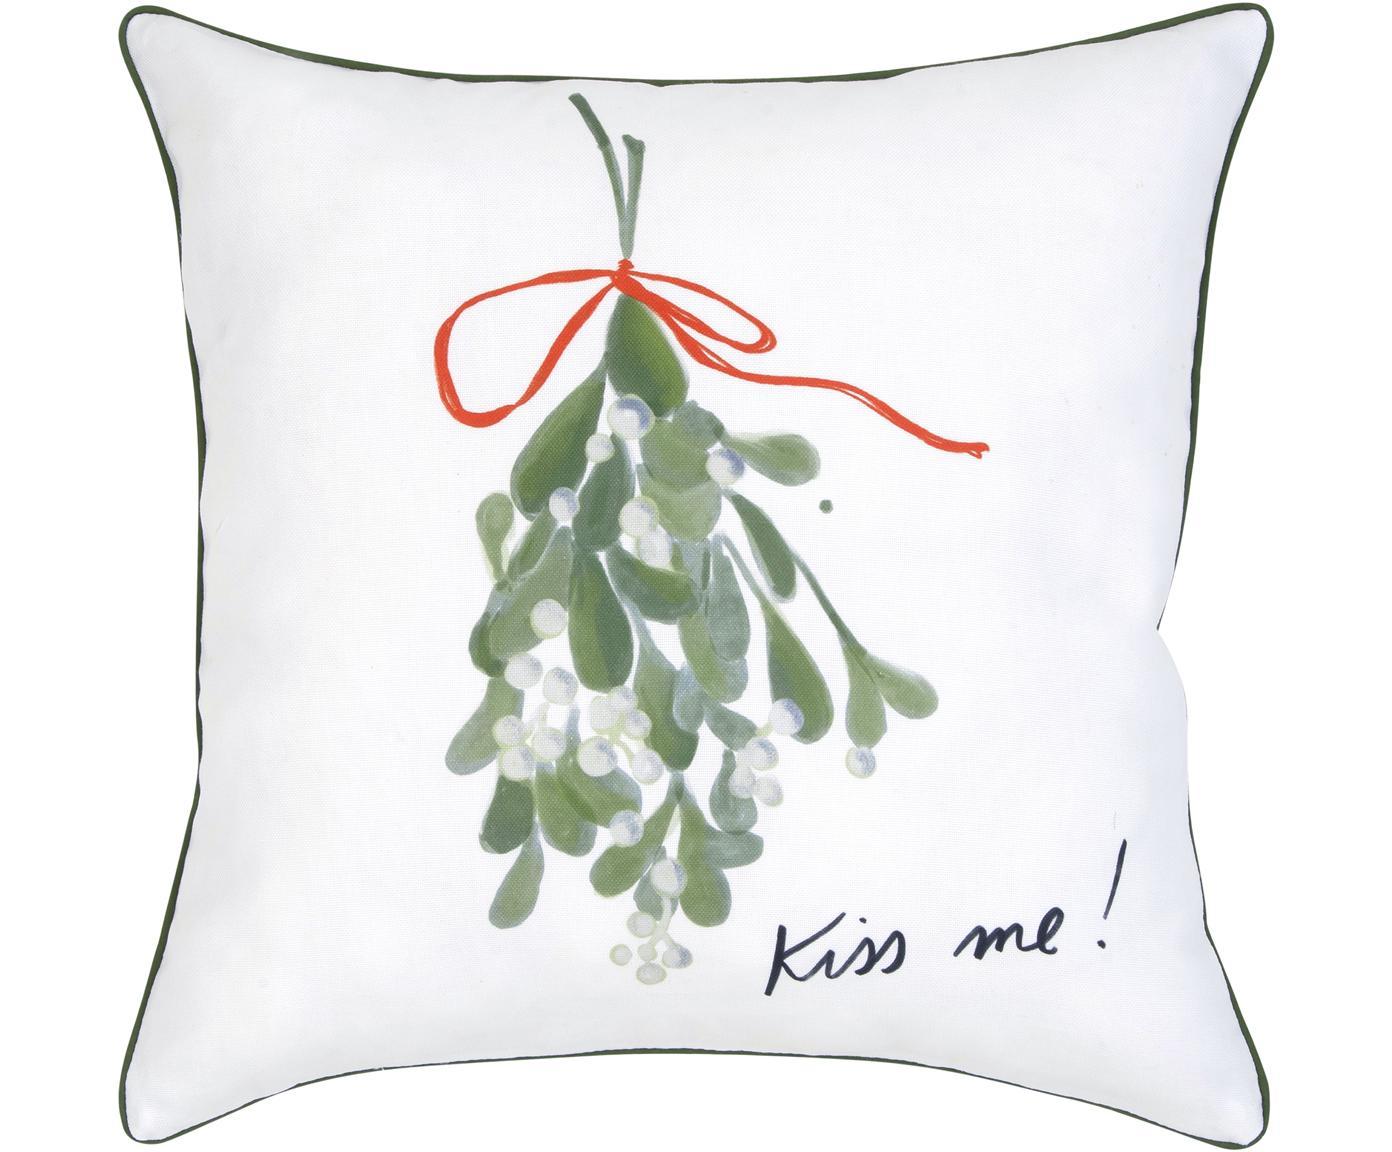 Kissenhülle Kiss Me, 100% Baumwolle, Kissen: MehrfarbigKederumrandung: Grün, 40 x 40 cm